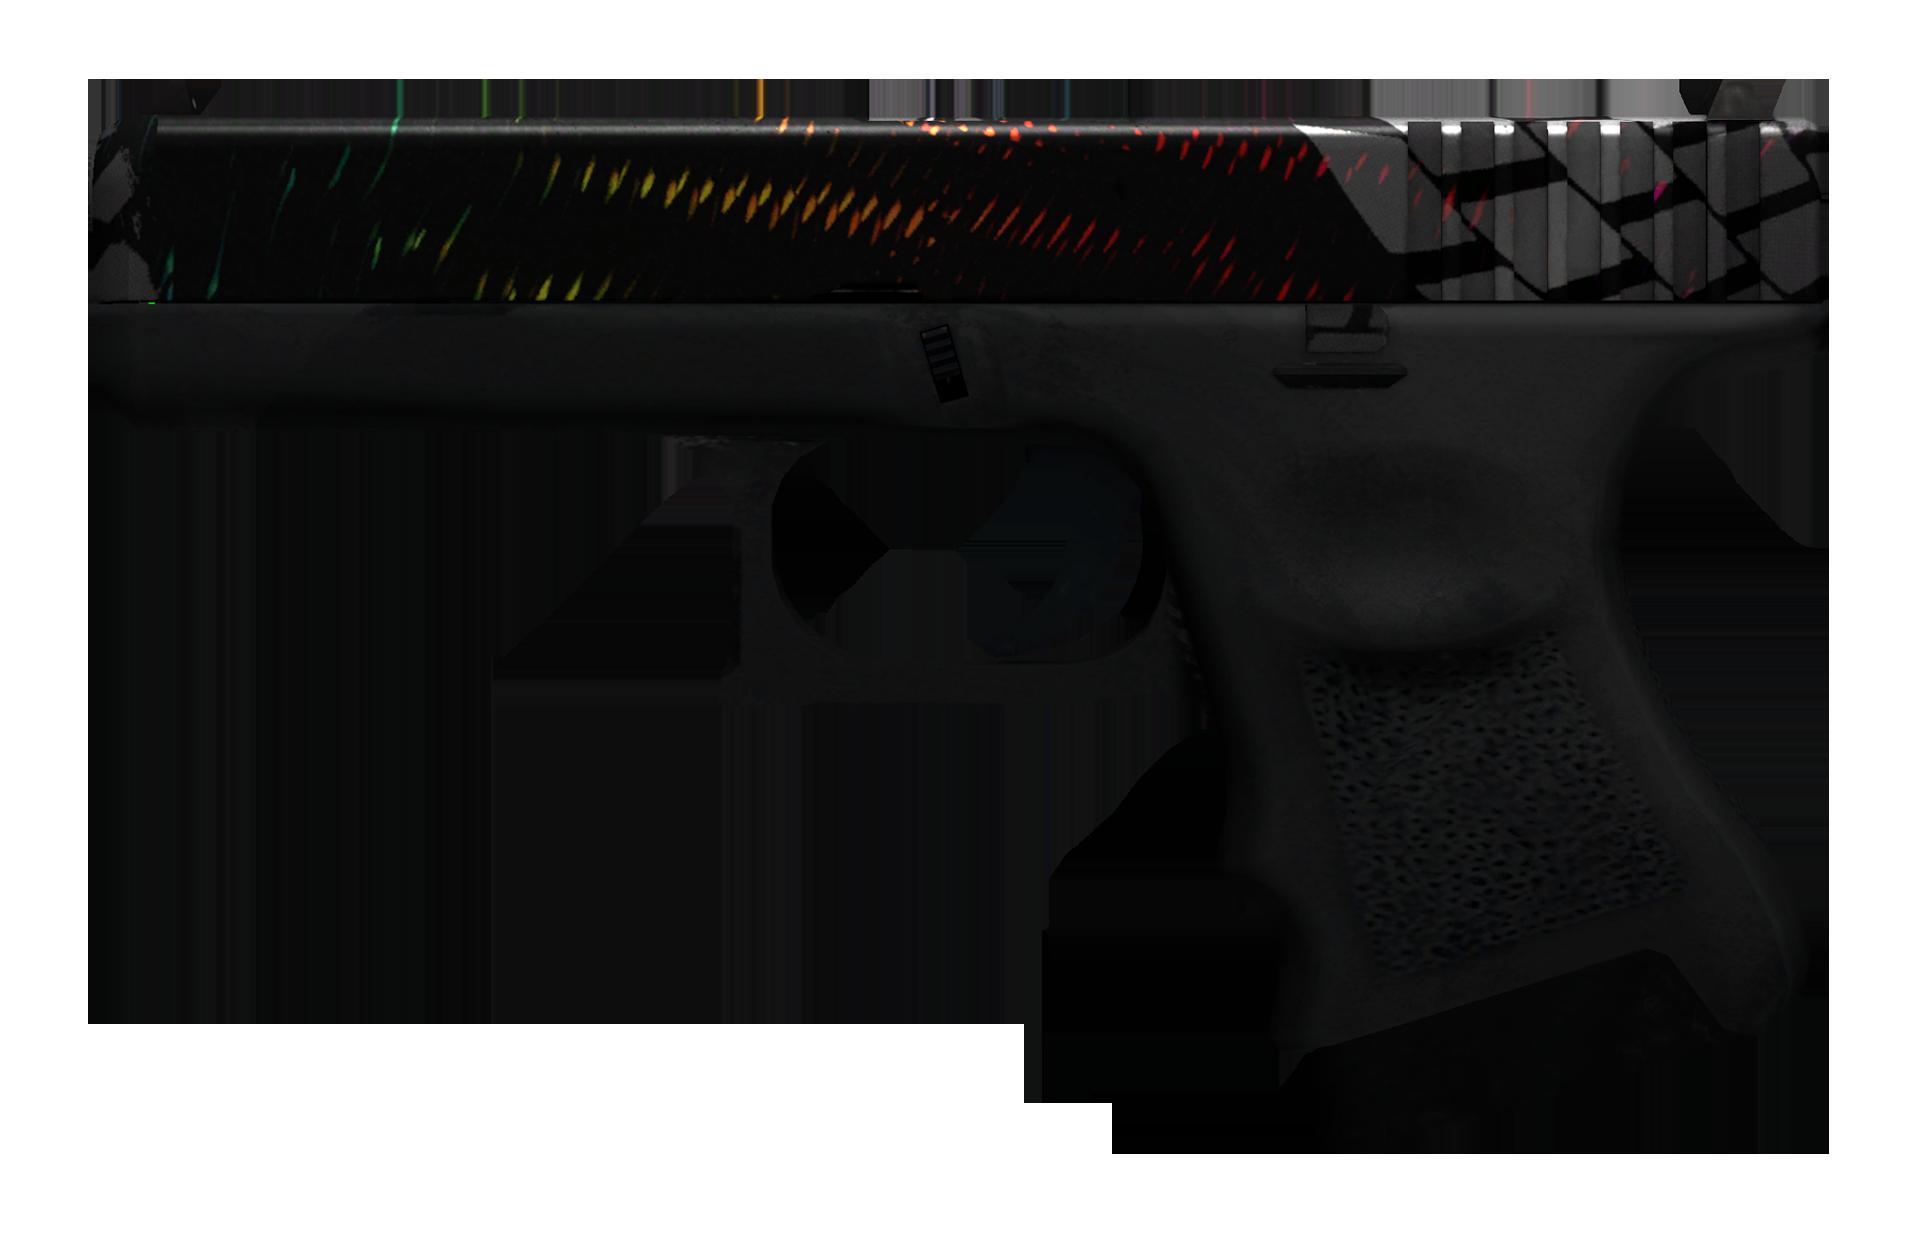 Glock-18 Grinder Large Rendering